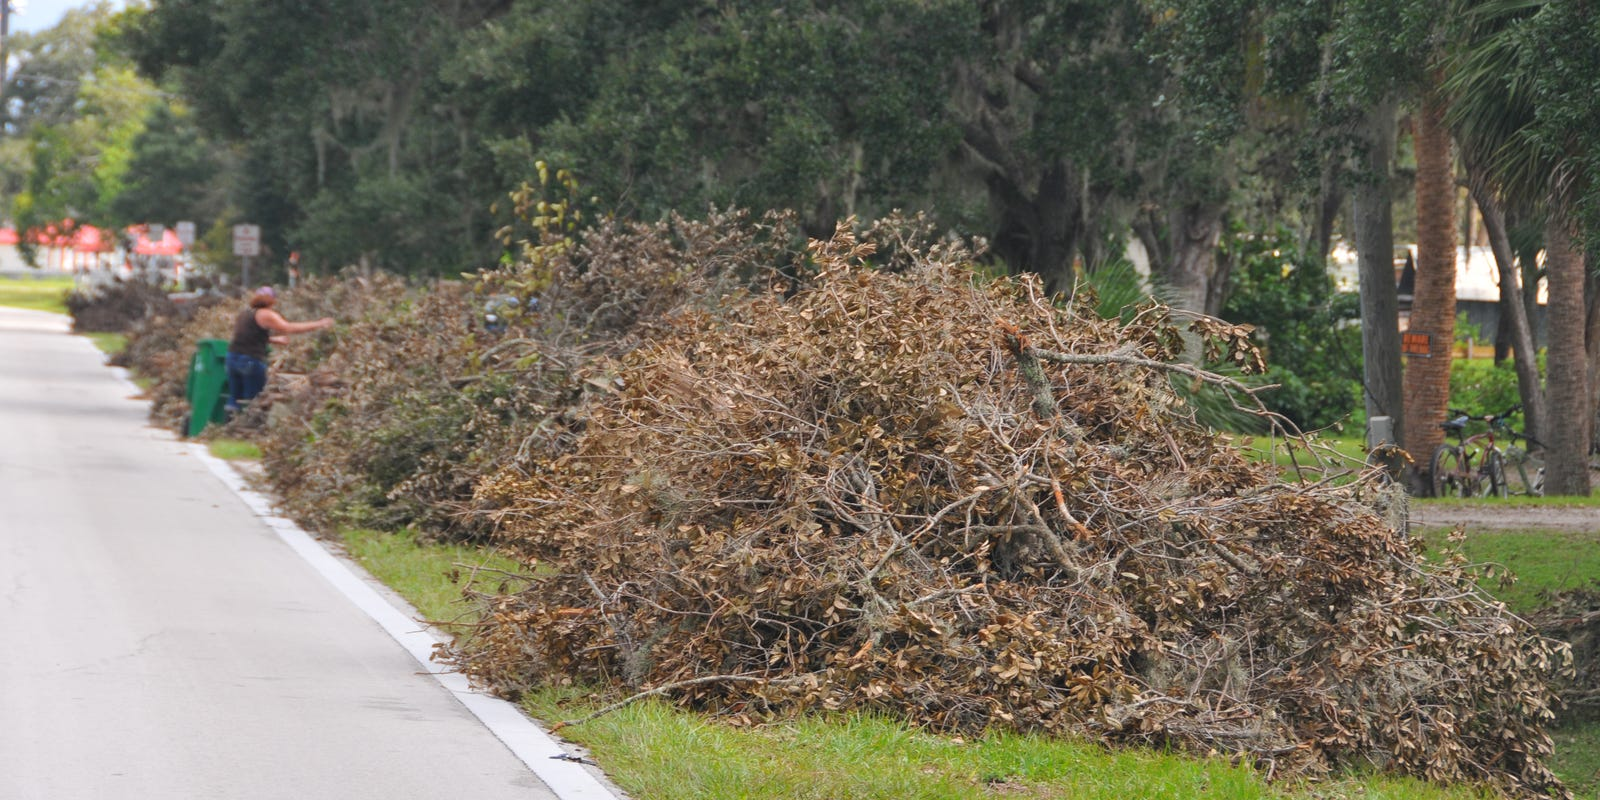 Debris pickup continues weeks after Hurricane Irma